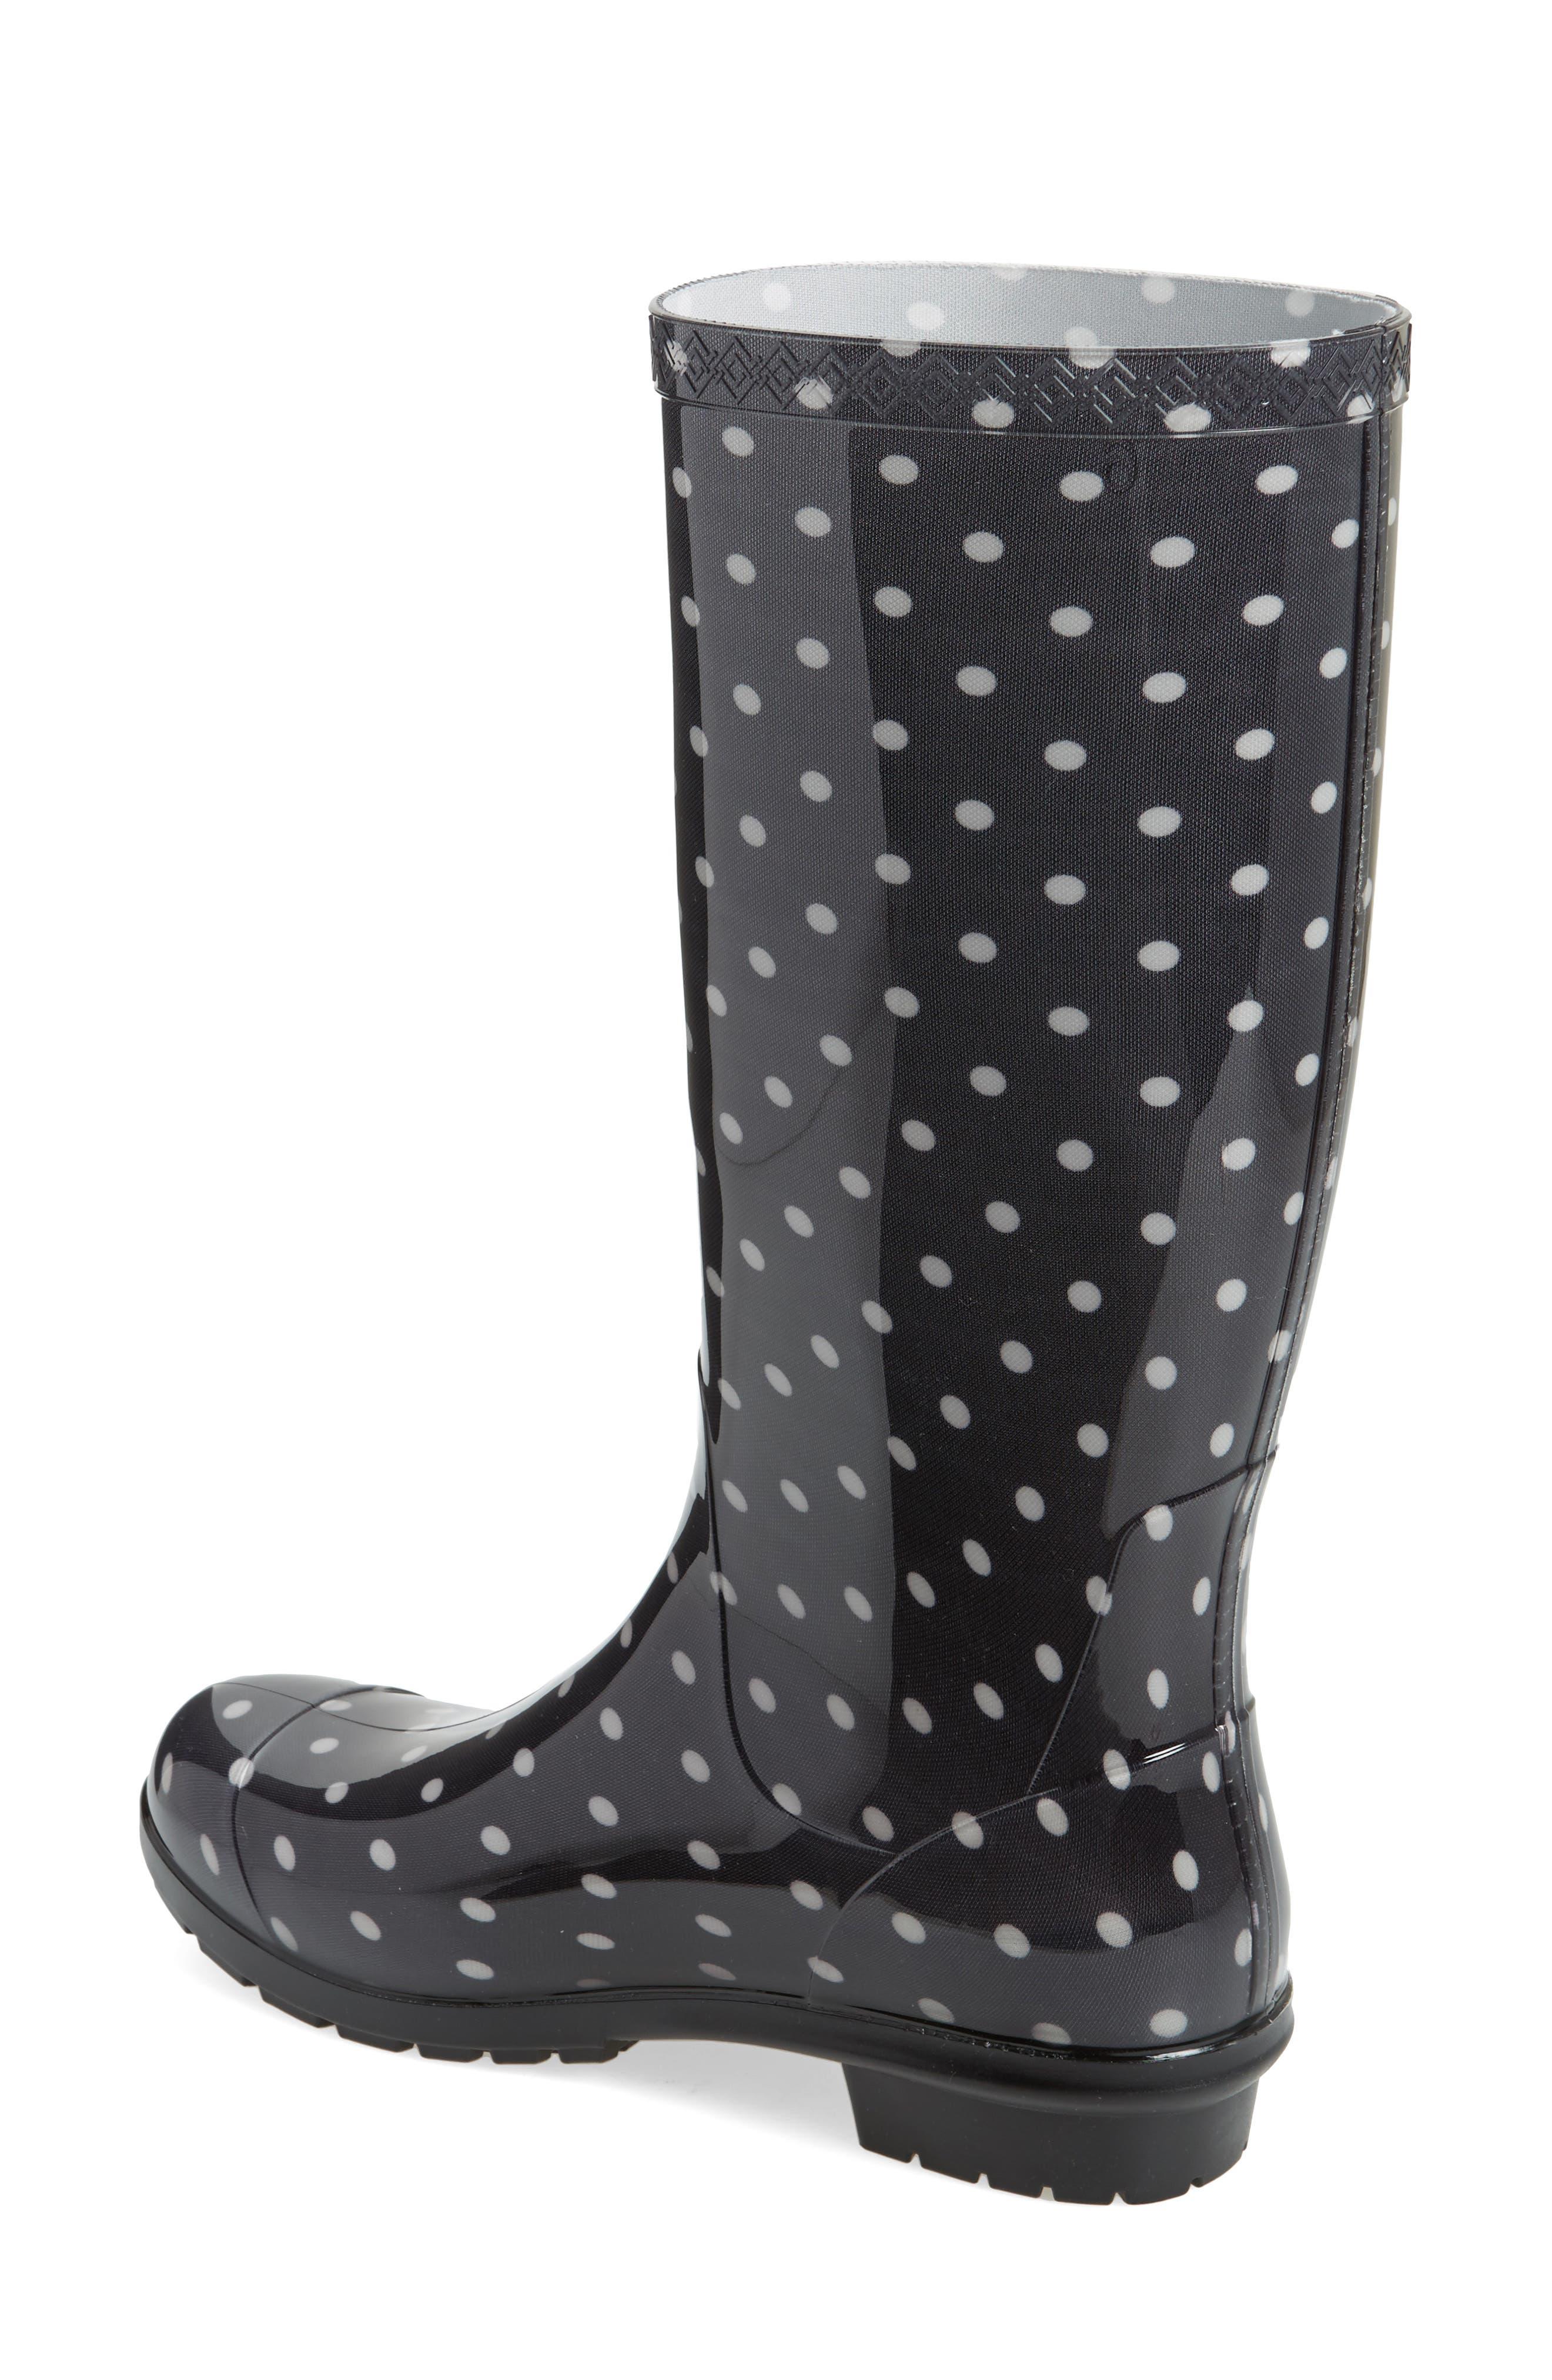 Shaye Polka Dot Rain Boot,                             Alternate thumbnail 2, color,                             Black/ White